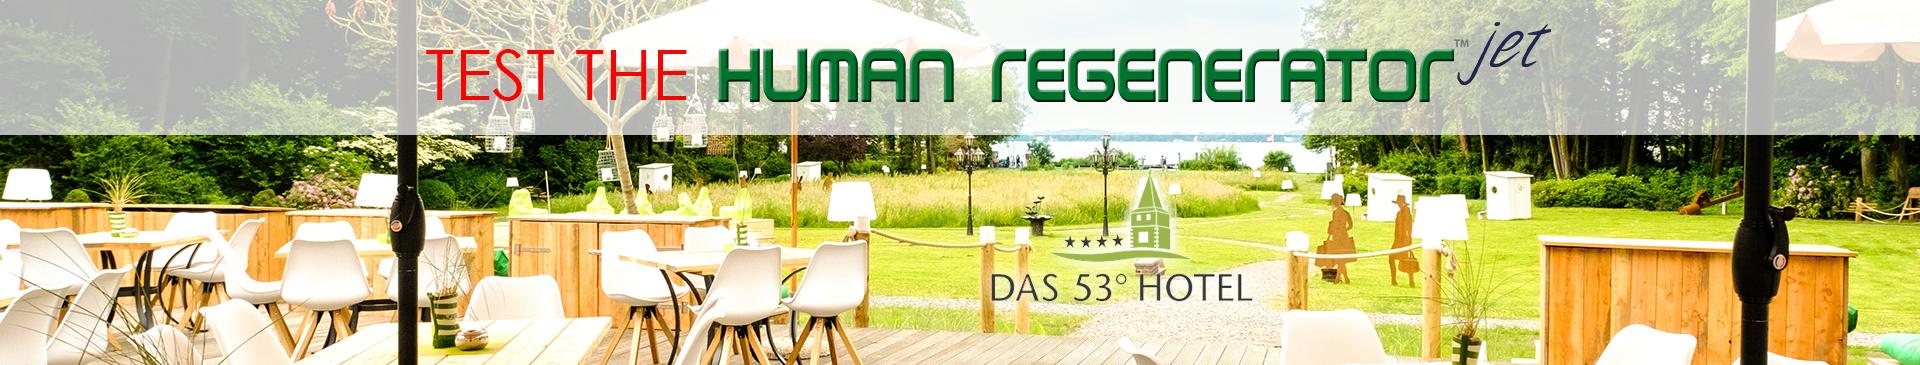 Test the Human Regenerator Jet